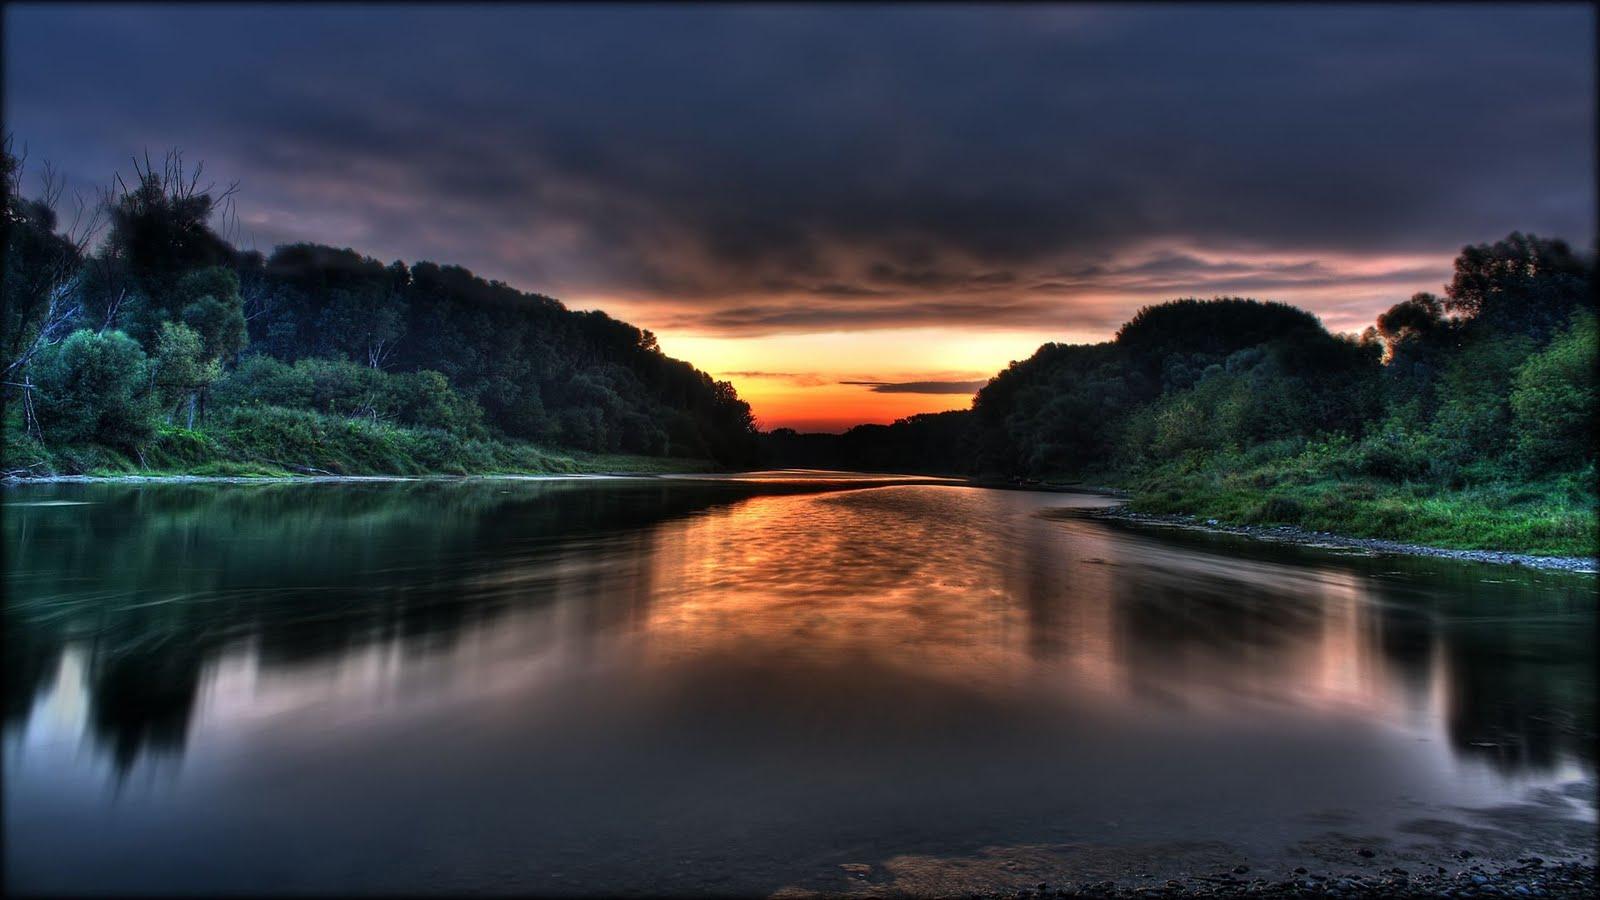 http://4.bp.blogspot.com/-Je1ZRCSt1_0/TdOdi-h73BI/AAAAAAAAO8c/ScIt5bTZ2ew/s1600/water-landscape-forest-lake-sunset-nature.jpg